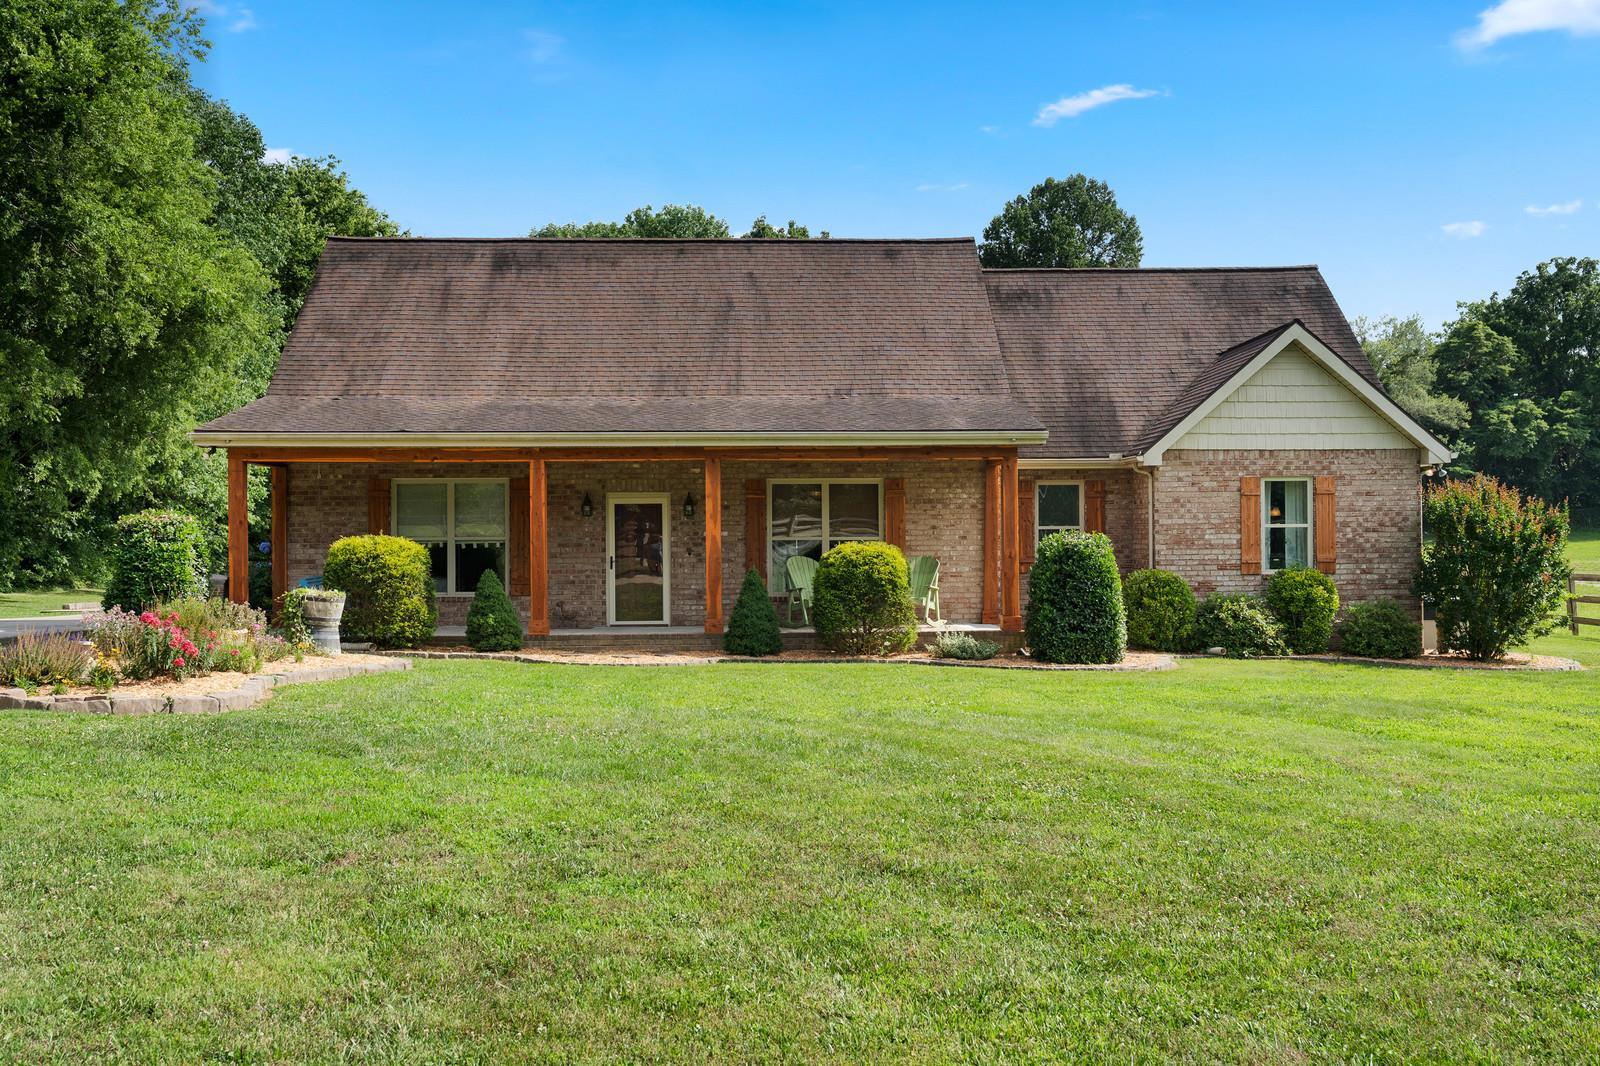 3055 Kinneys Rd, Cedar Hill, TN 37032 - Cedar Hill, TN real estate listing